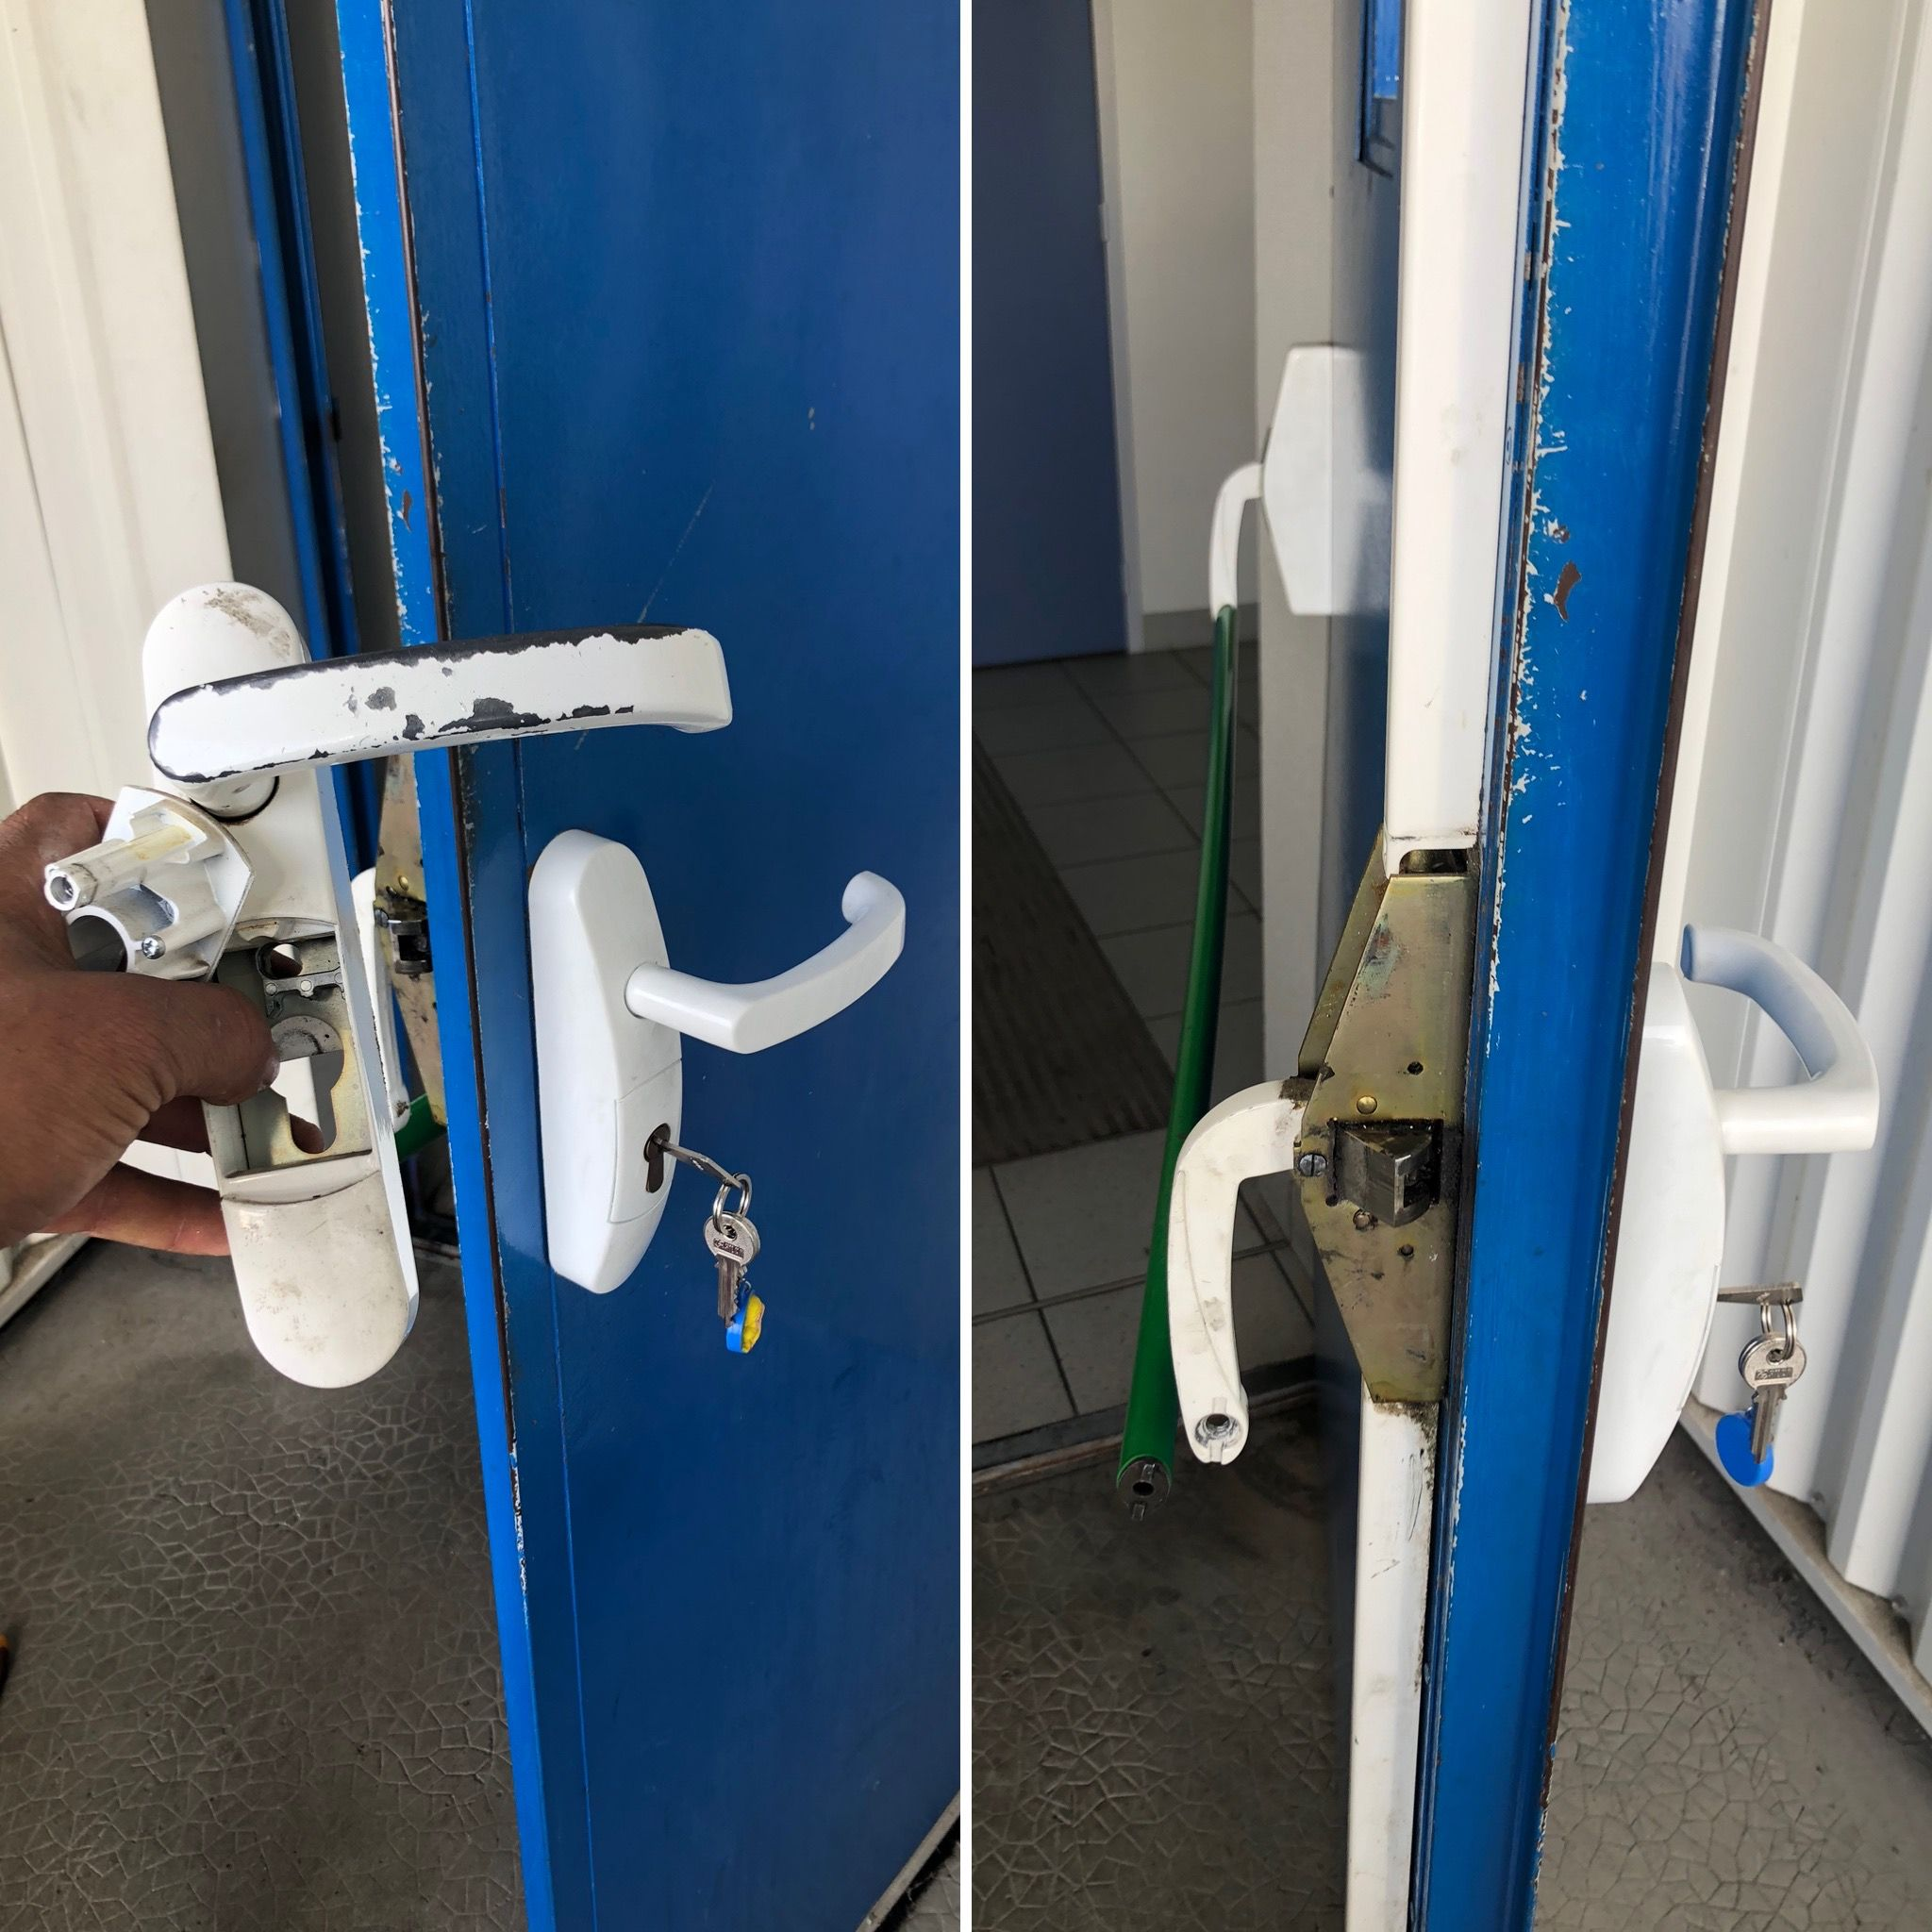 Changement Poignee Porte Anti Panique Poignee De Porte Porte De Secours Serrure Porte